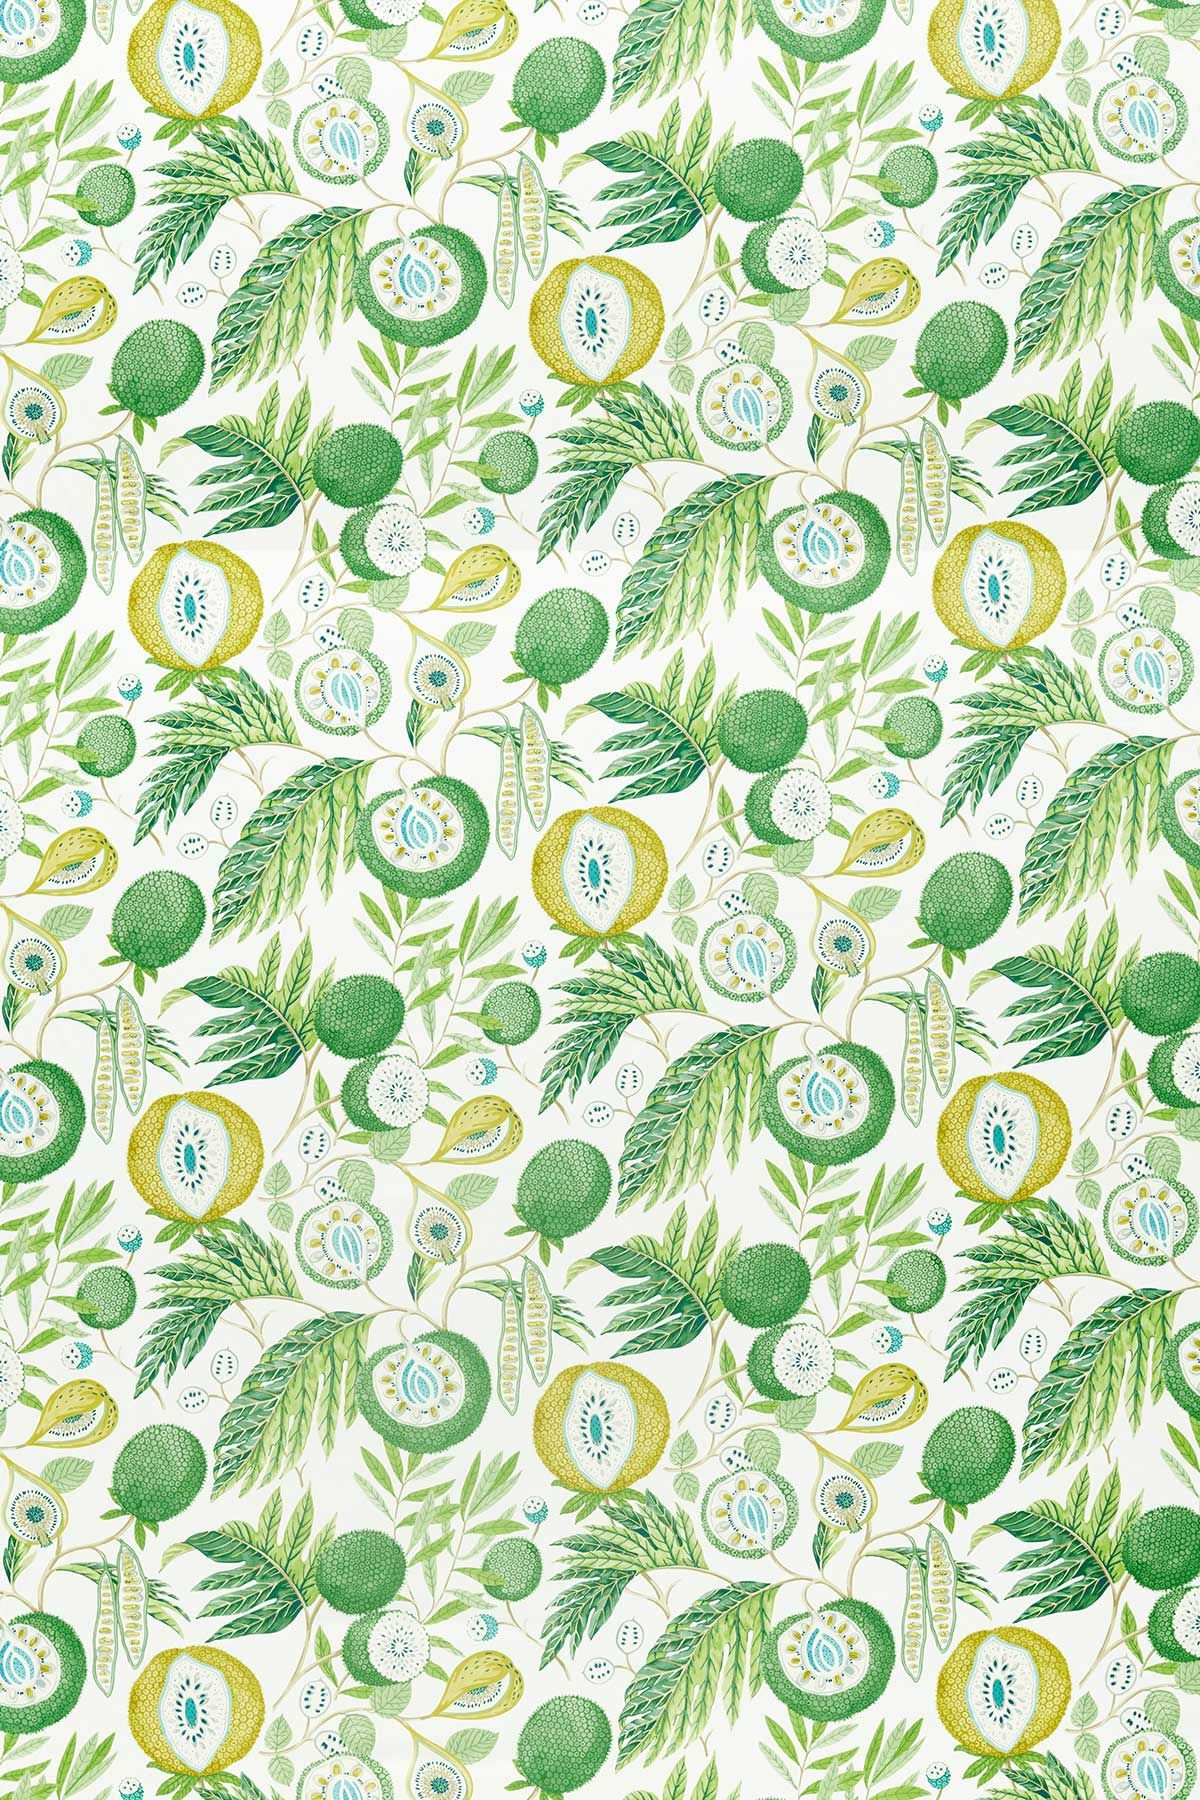 Jackfruit by Sanderson Botanical Green Fabric 226559